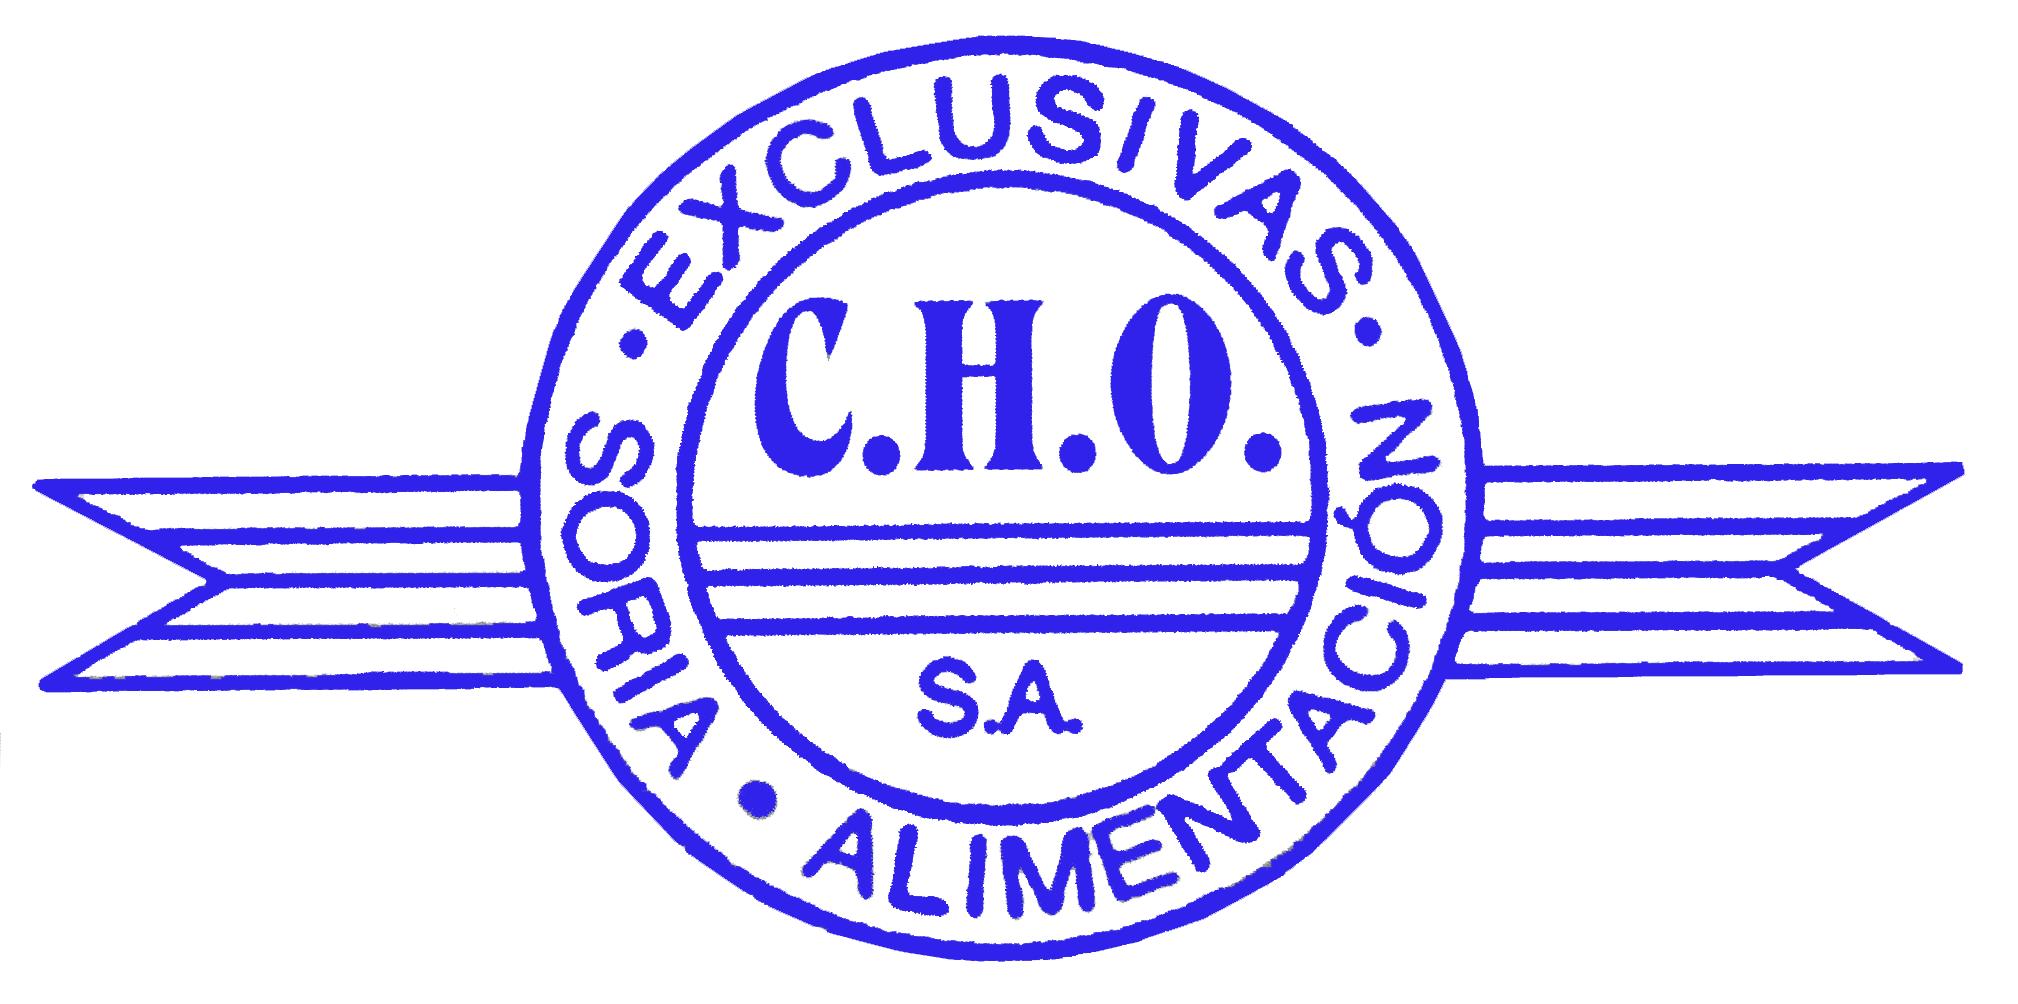 COMERCIAL HERMANOS ORTEGA S.A.